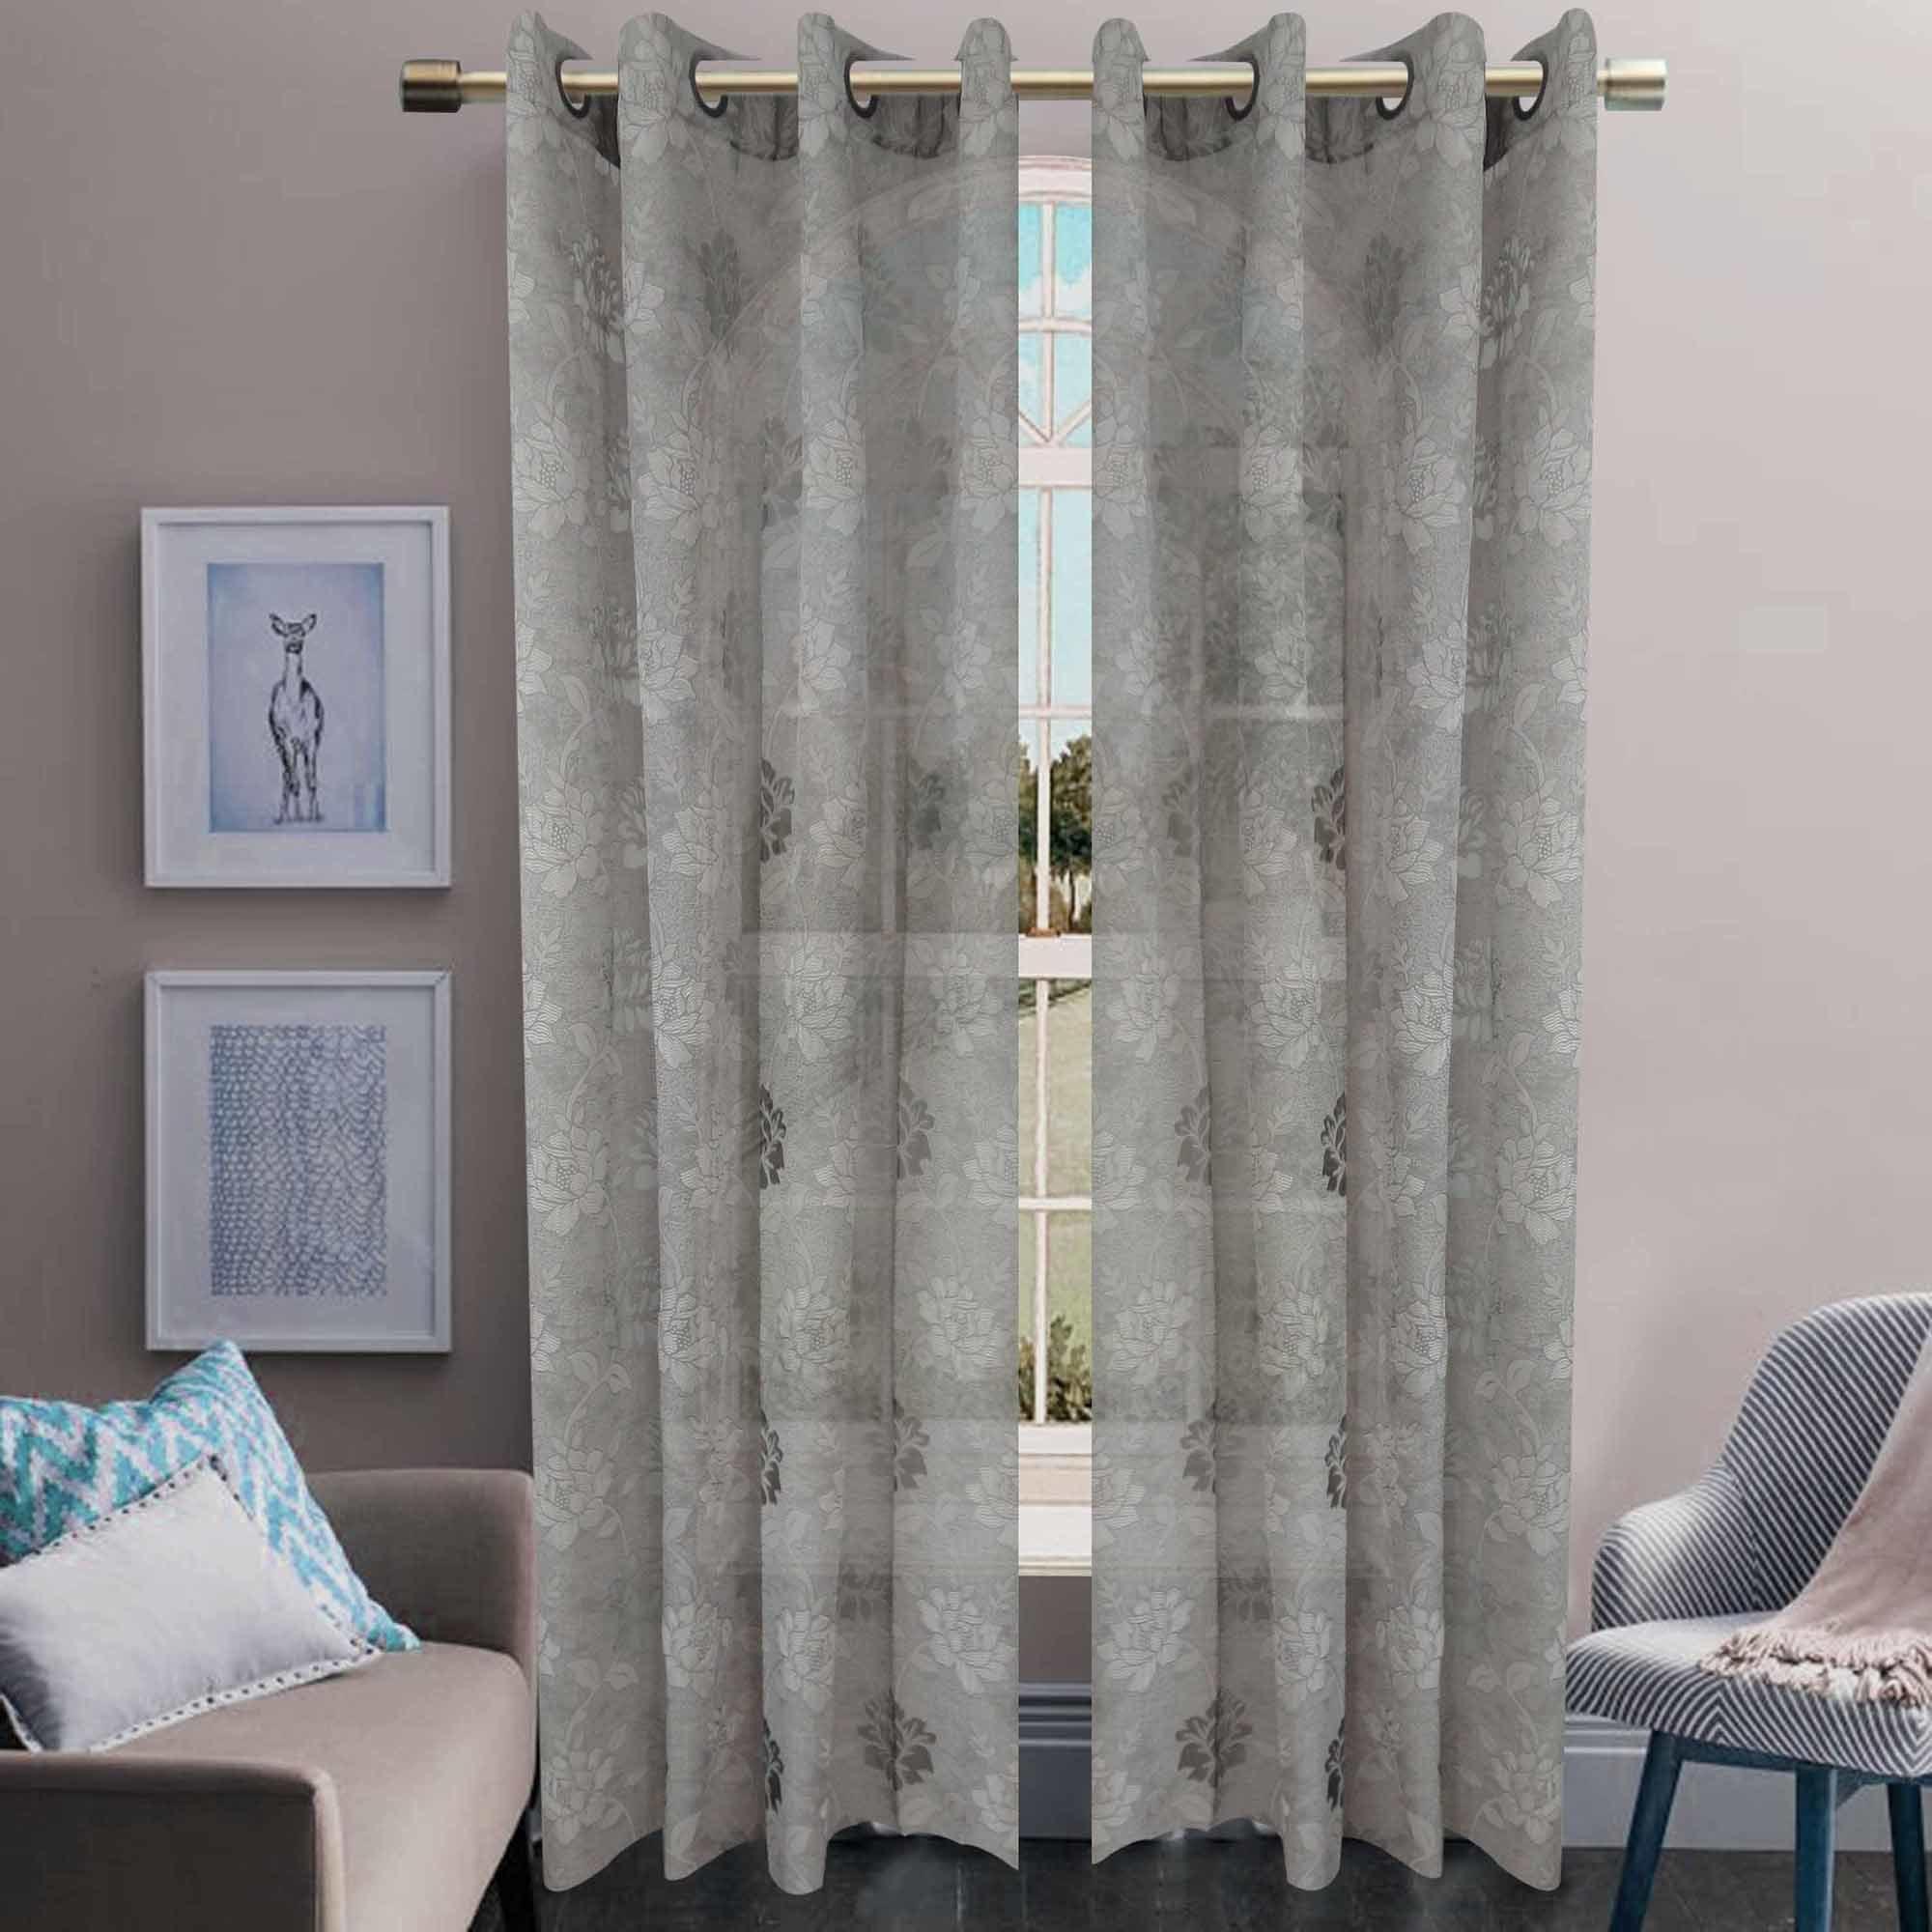 Jacquard Sheer Grommet Panel Window Curtain (HR14WT082)